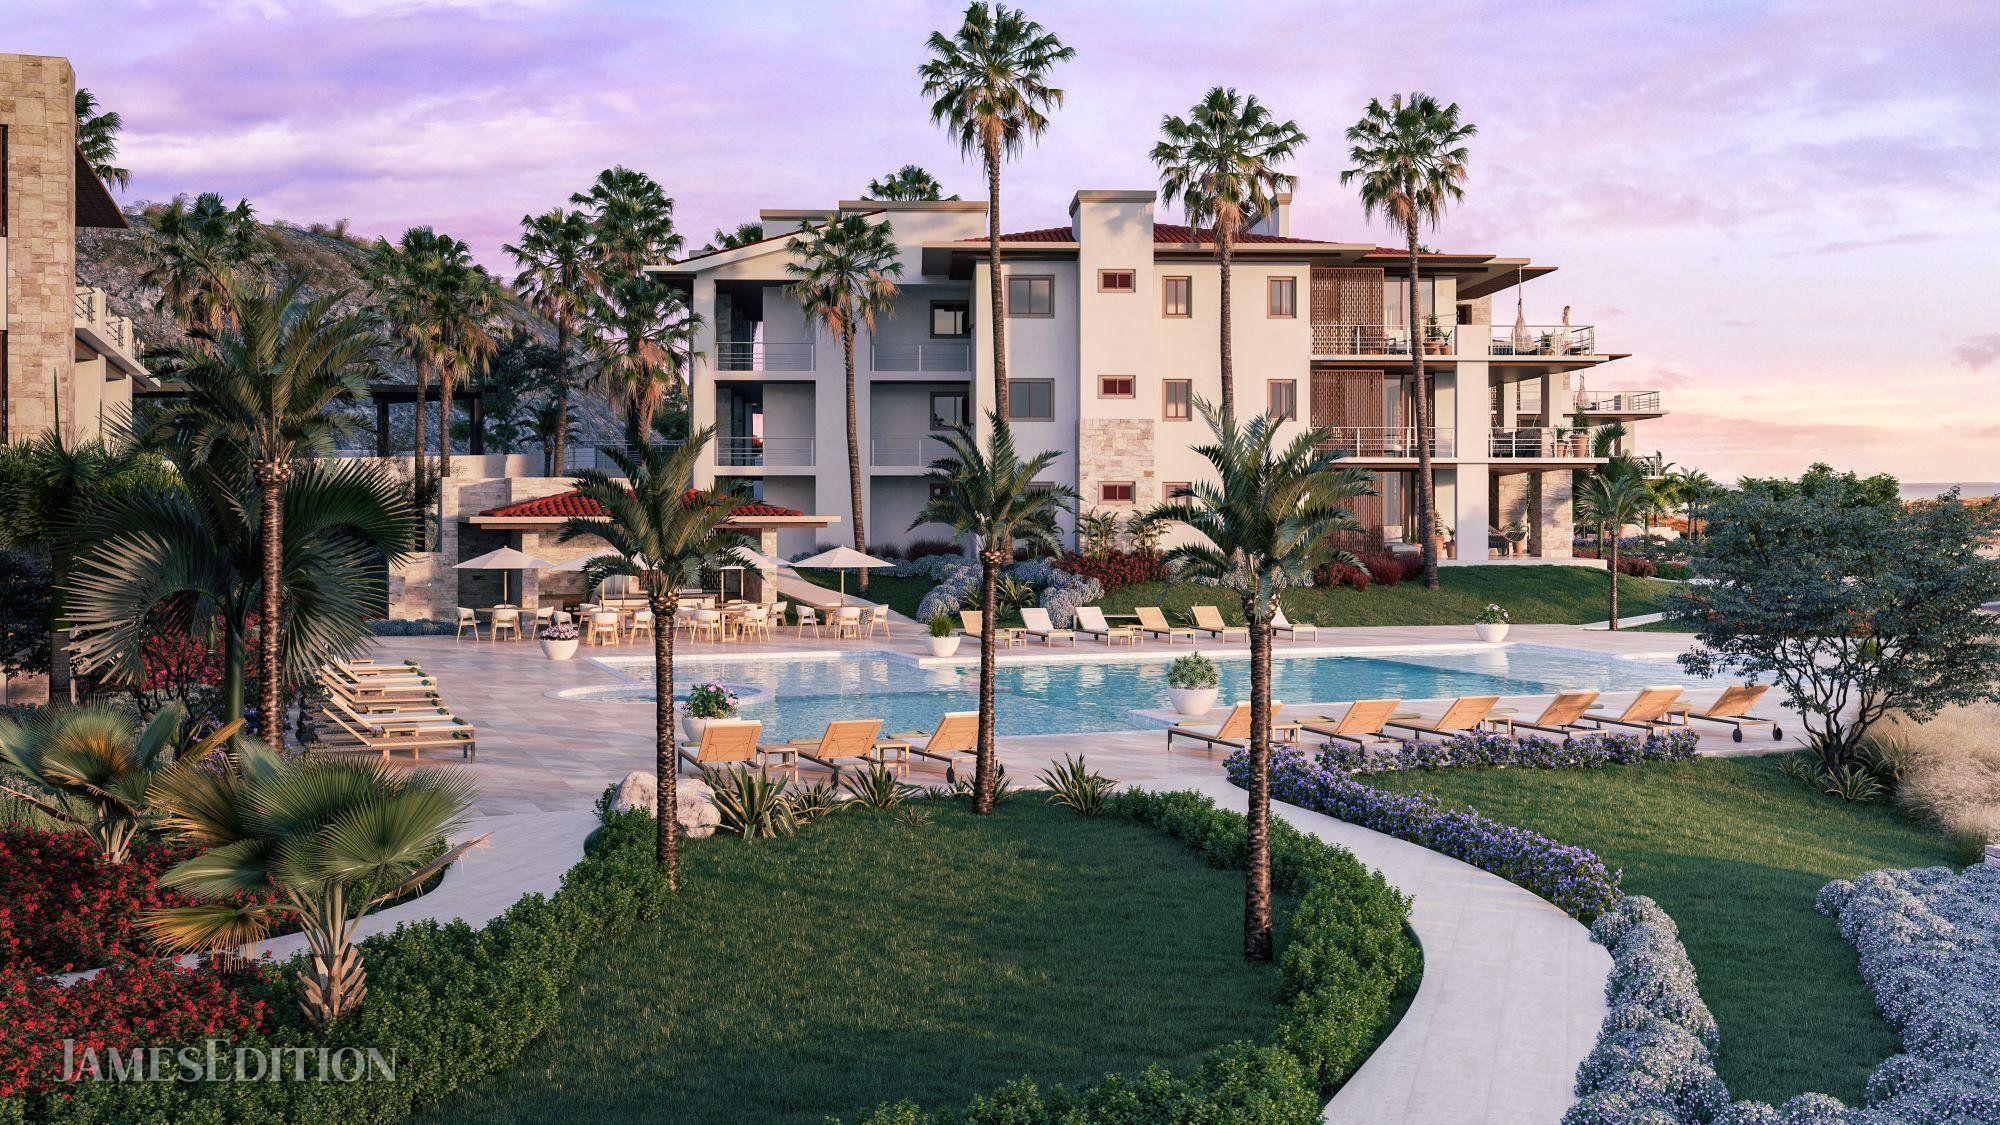 Apartment in del Sol, Baja California Sur, Mexico 1